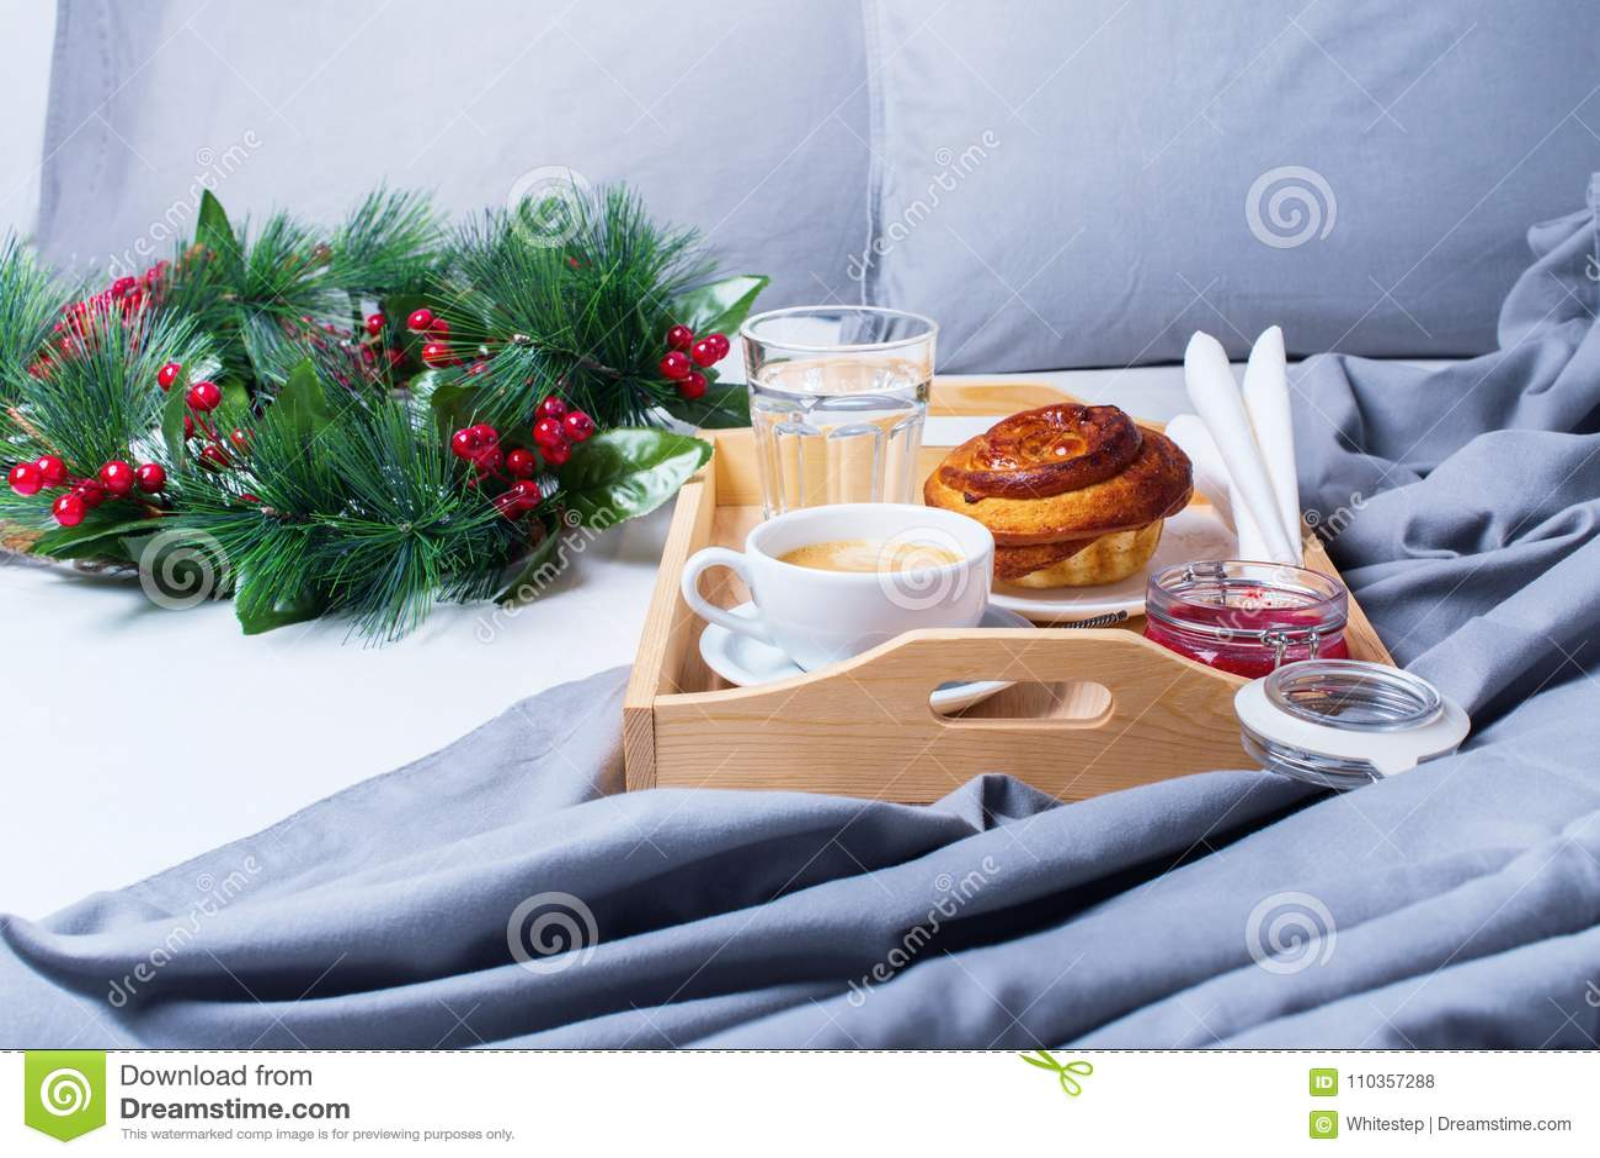 Frühstücks-Bett-Tray Coffee Bun Grey Early-Morgen